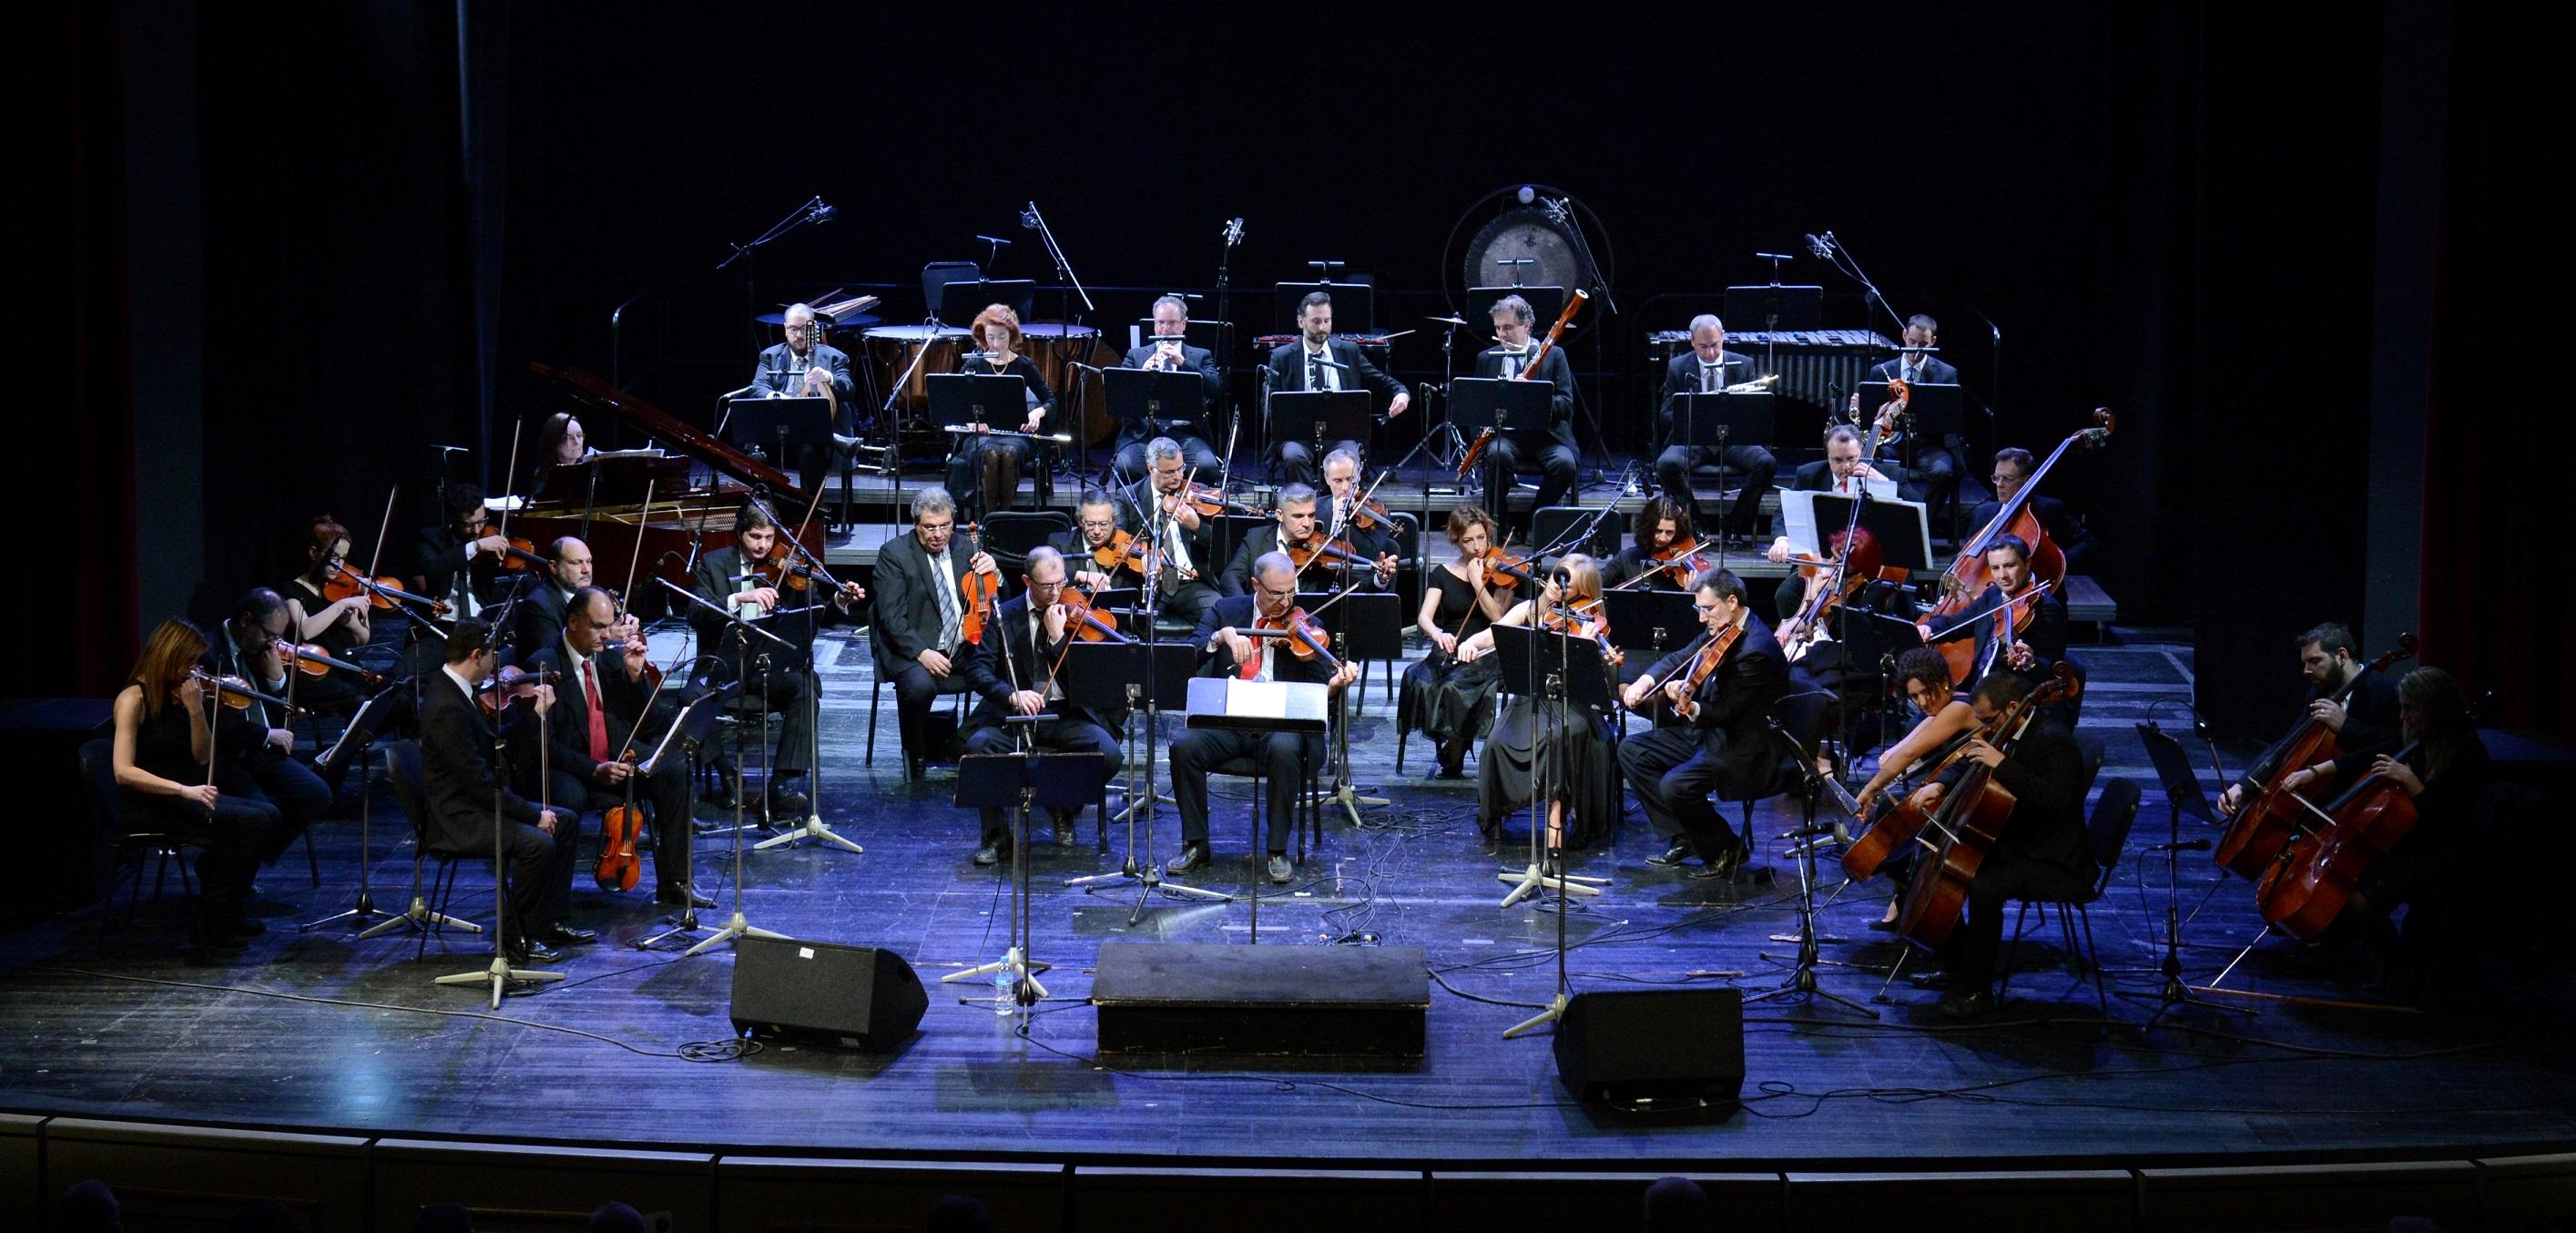 Live συναυλία στο Kosmos 93,6: Η Ορχήστρα Σύγχρονης Μουσικής της ΕΡΤ θυμάται τέσσερις θρύλους της σύγχρονης pop/rock